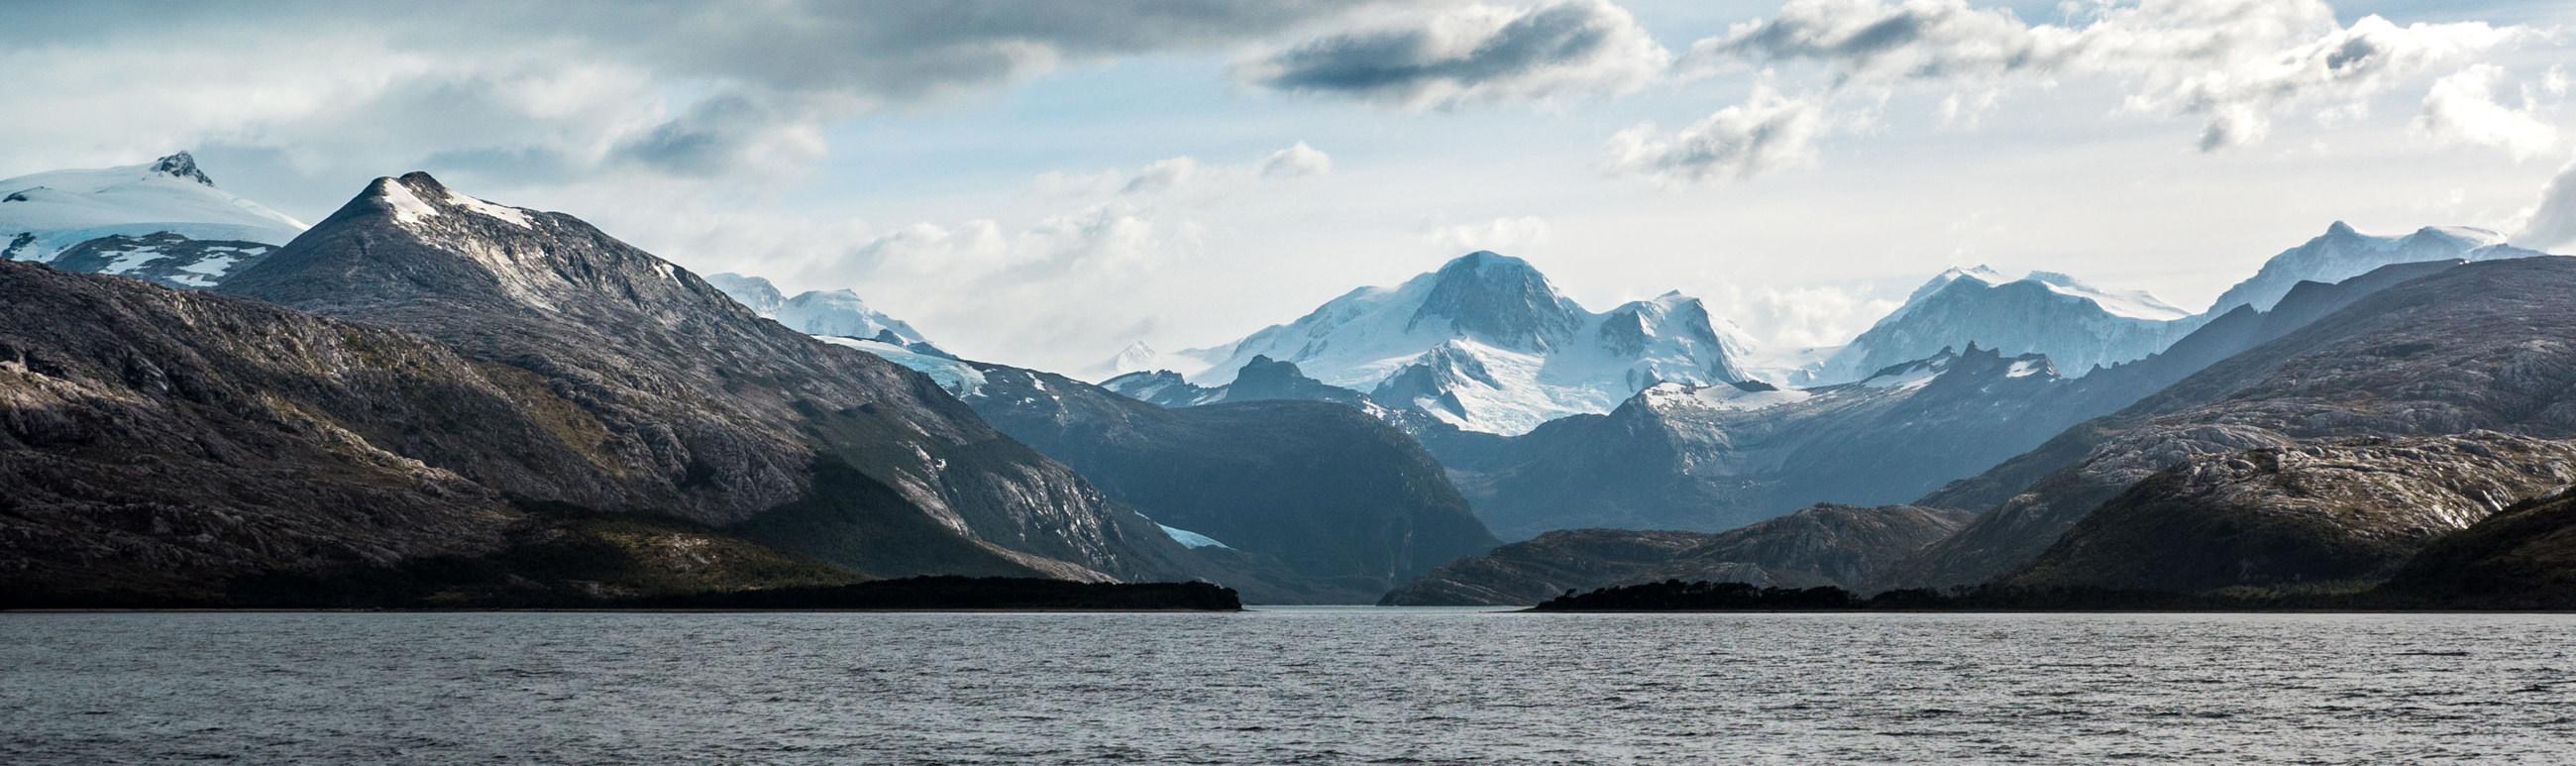 Australis Cruise Patagonia Atacama18